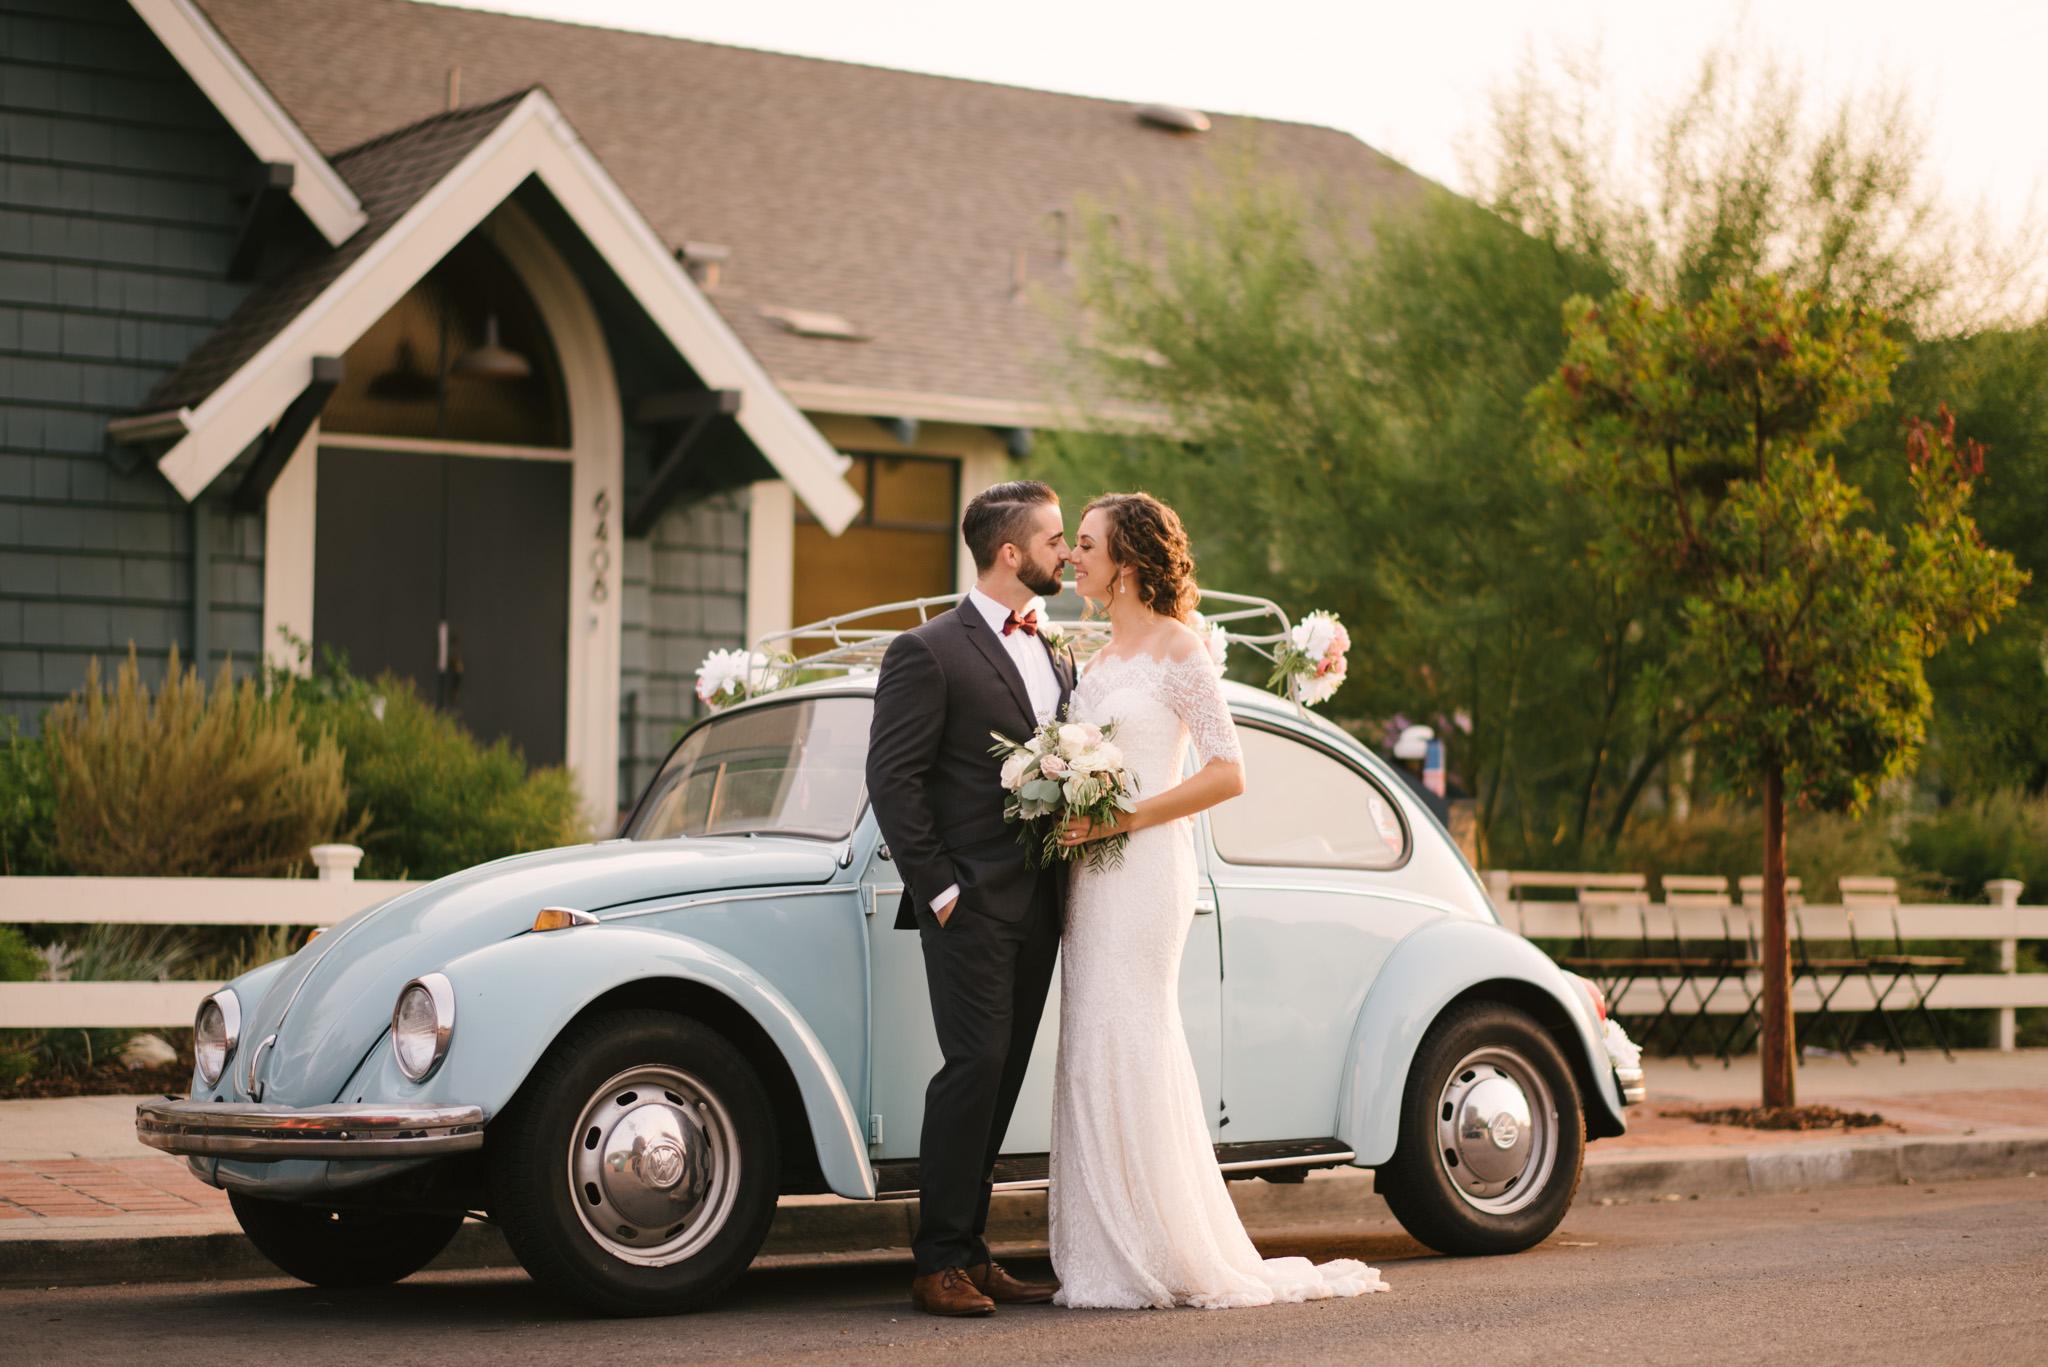 LJ-Ruby-Street-Los-Angeles-County-Wedding-Photography-13